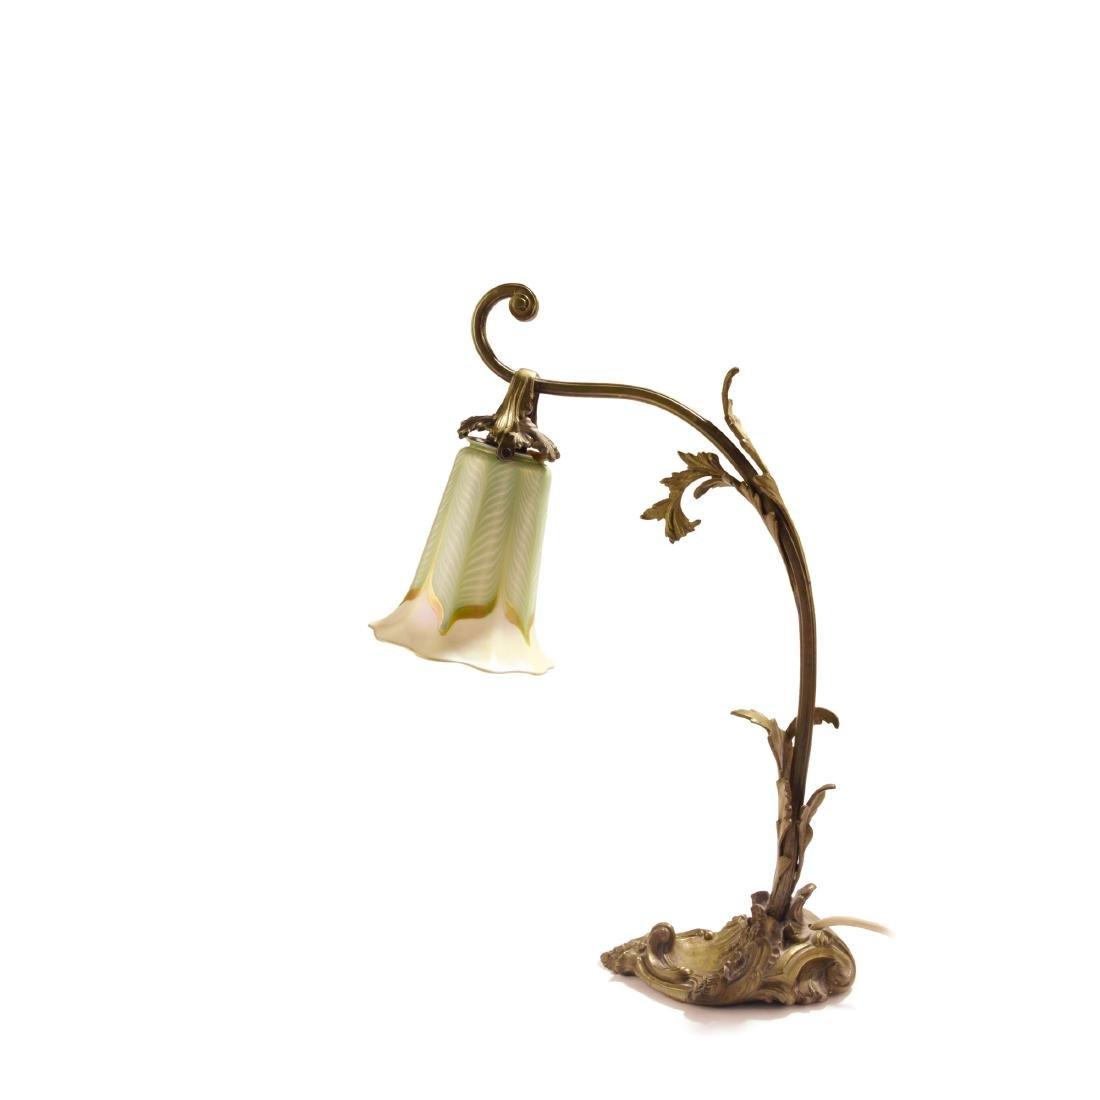 Table light, c1910-15